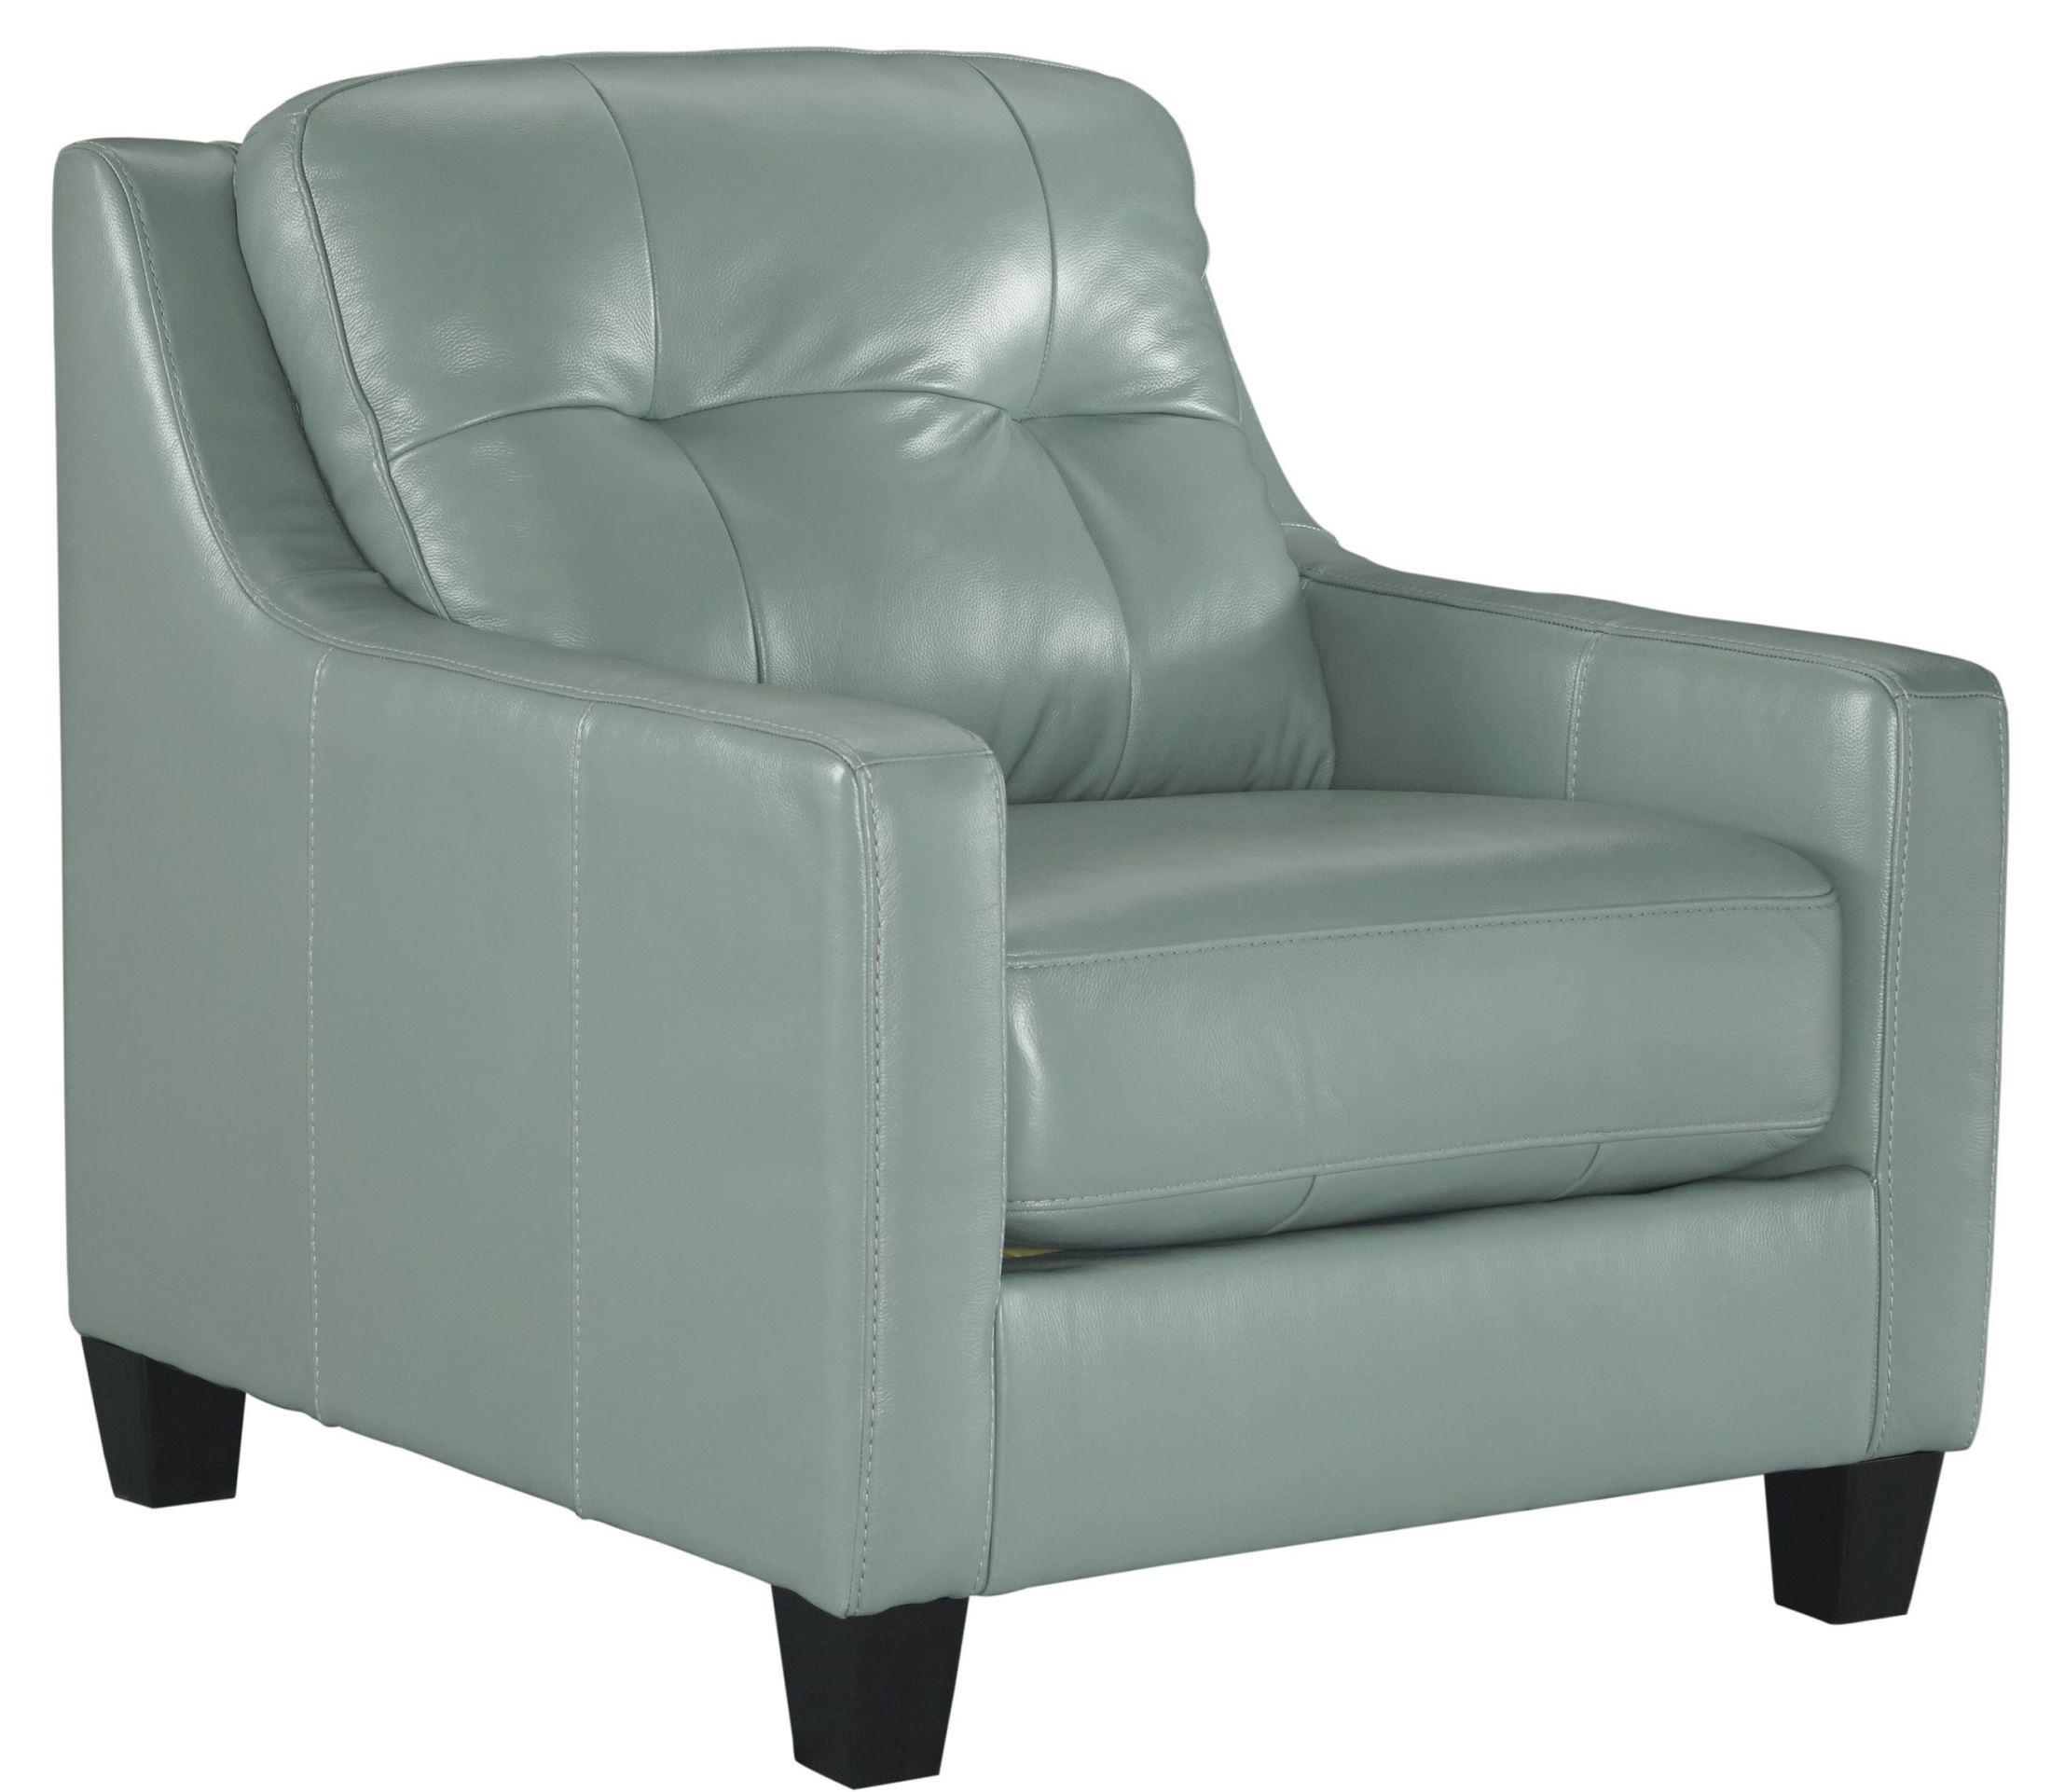 Kean Sky Chair, 5910320, Ashley